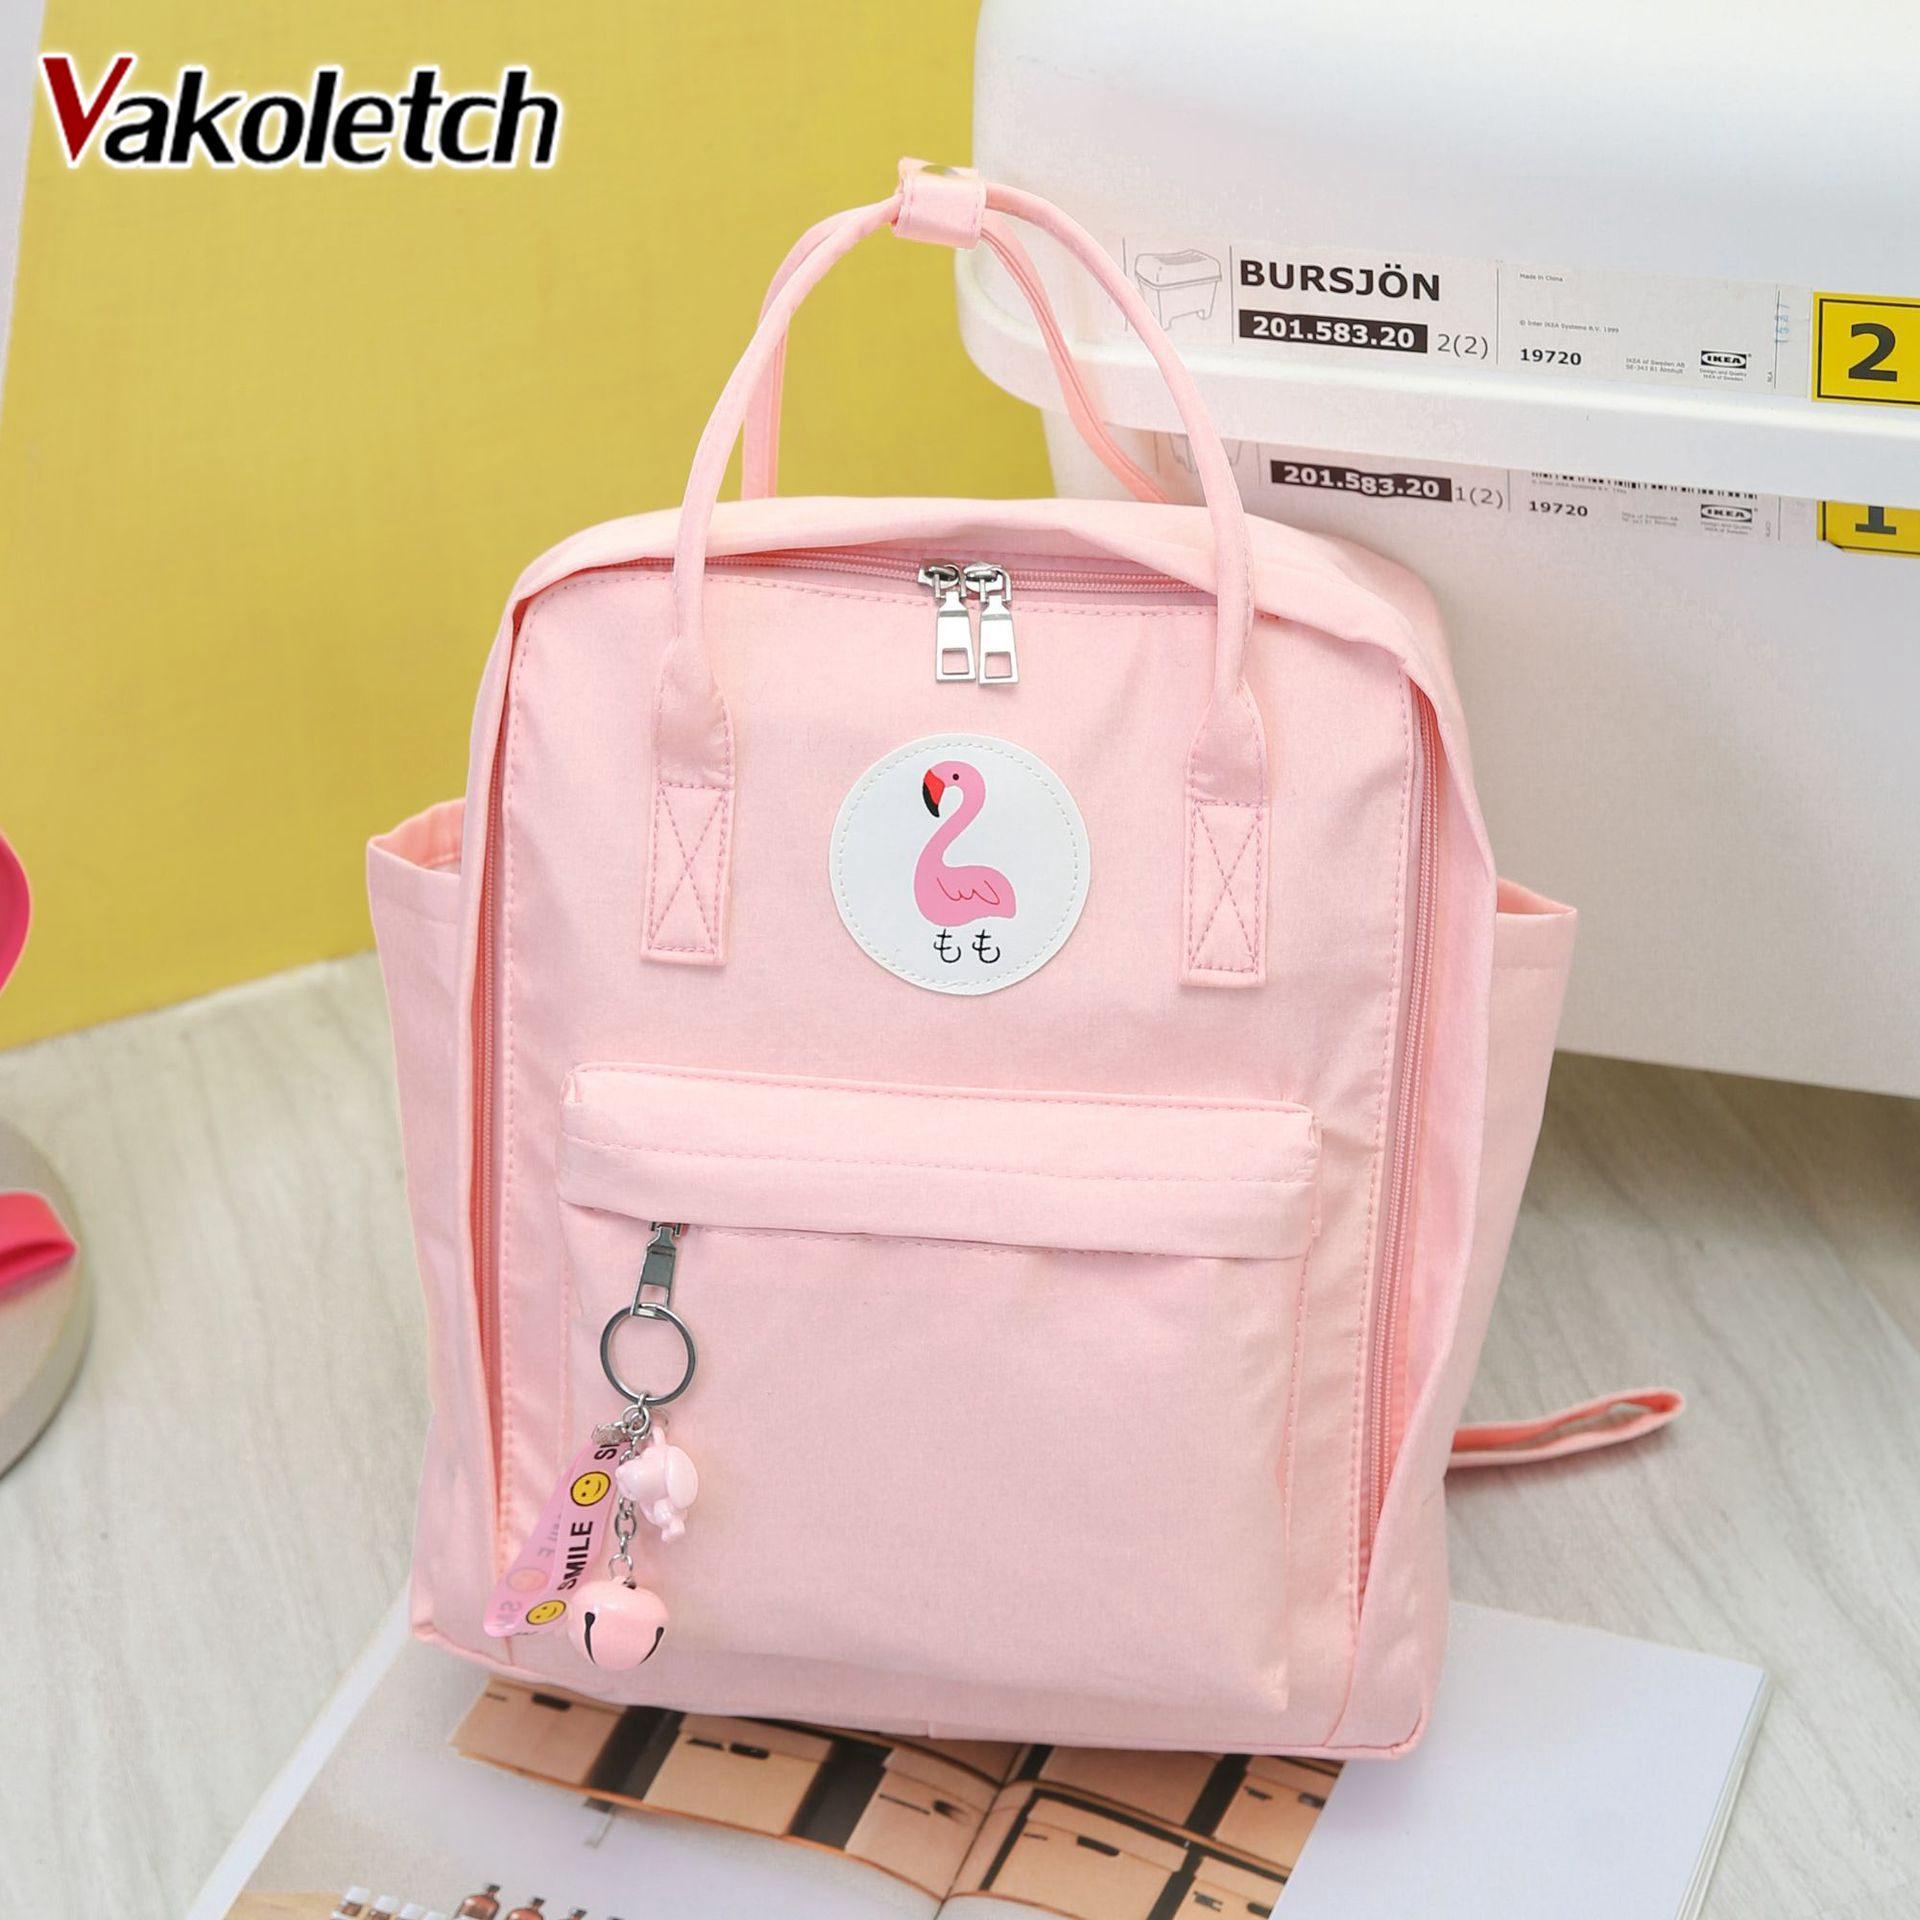 Fashion Flamingo Female Backpack School Bag For Girls Harajuku Student Bookbag Preppy Waterproof Nylon Women Backpack KL667